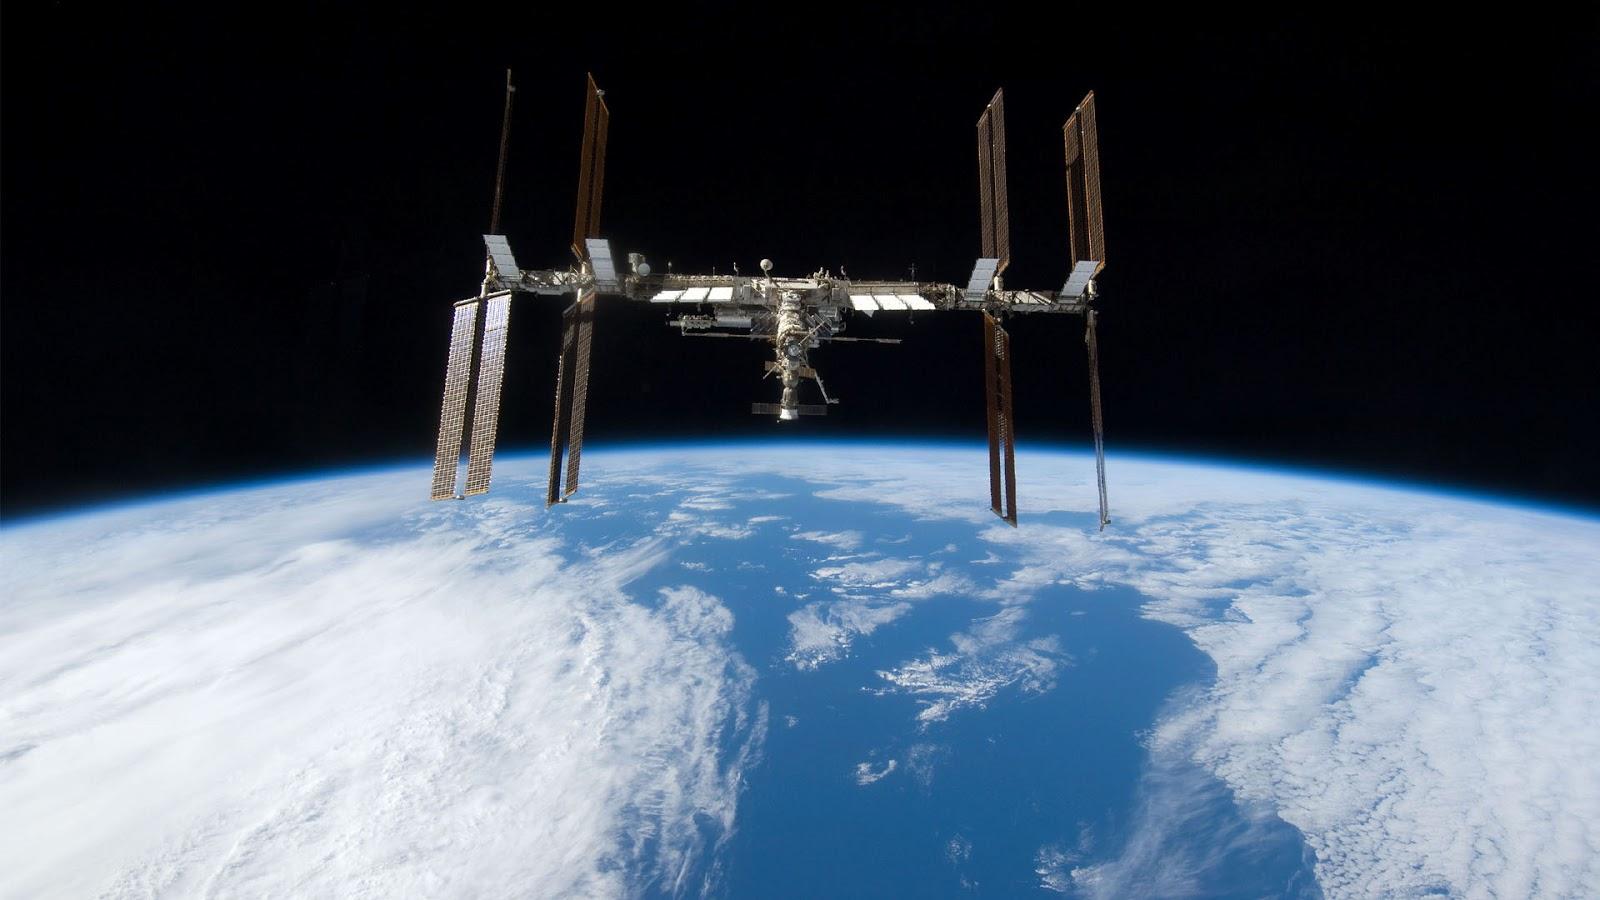 International space station wallpaper wallpapersafari - Space wallpaper 1600x900 ...